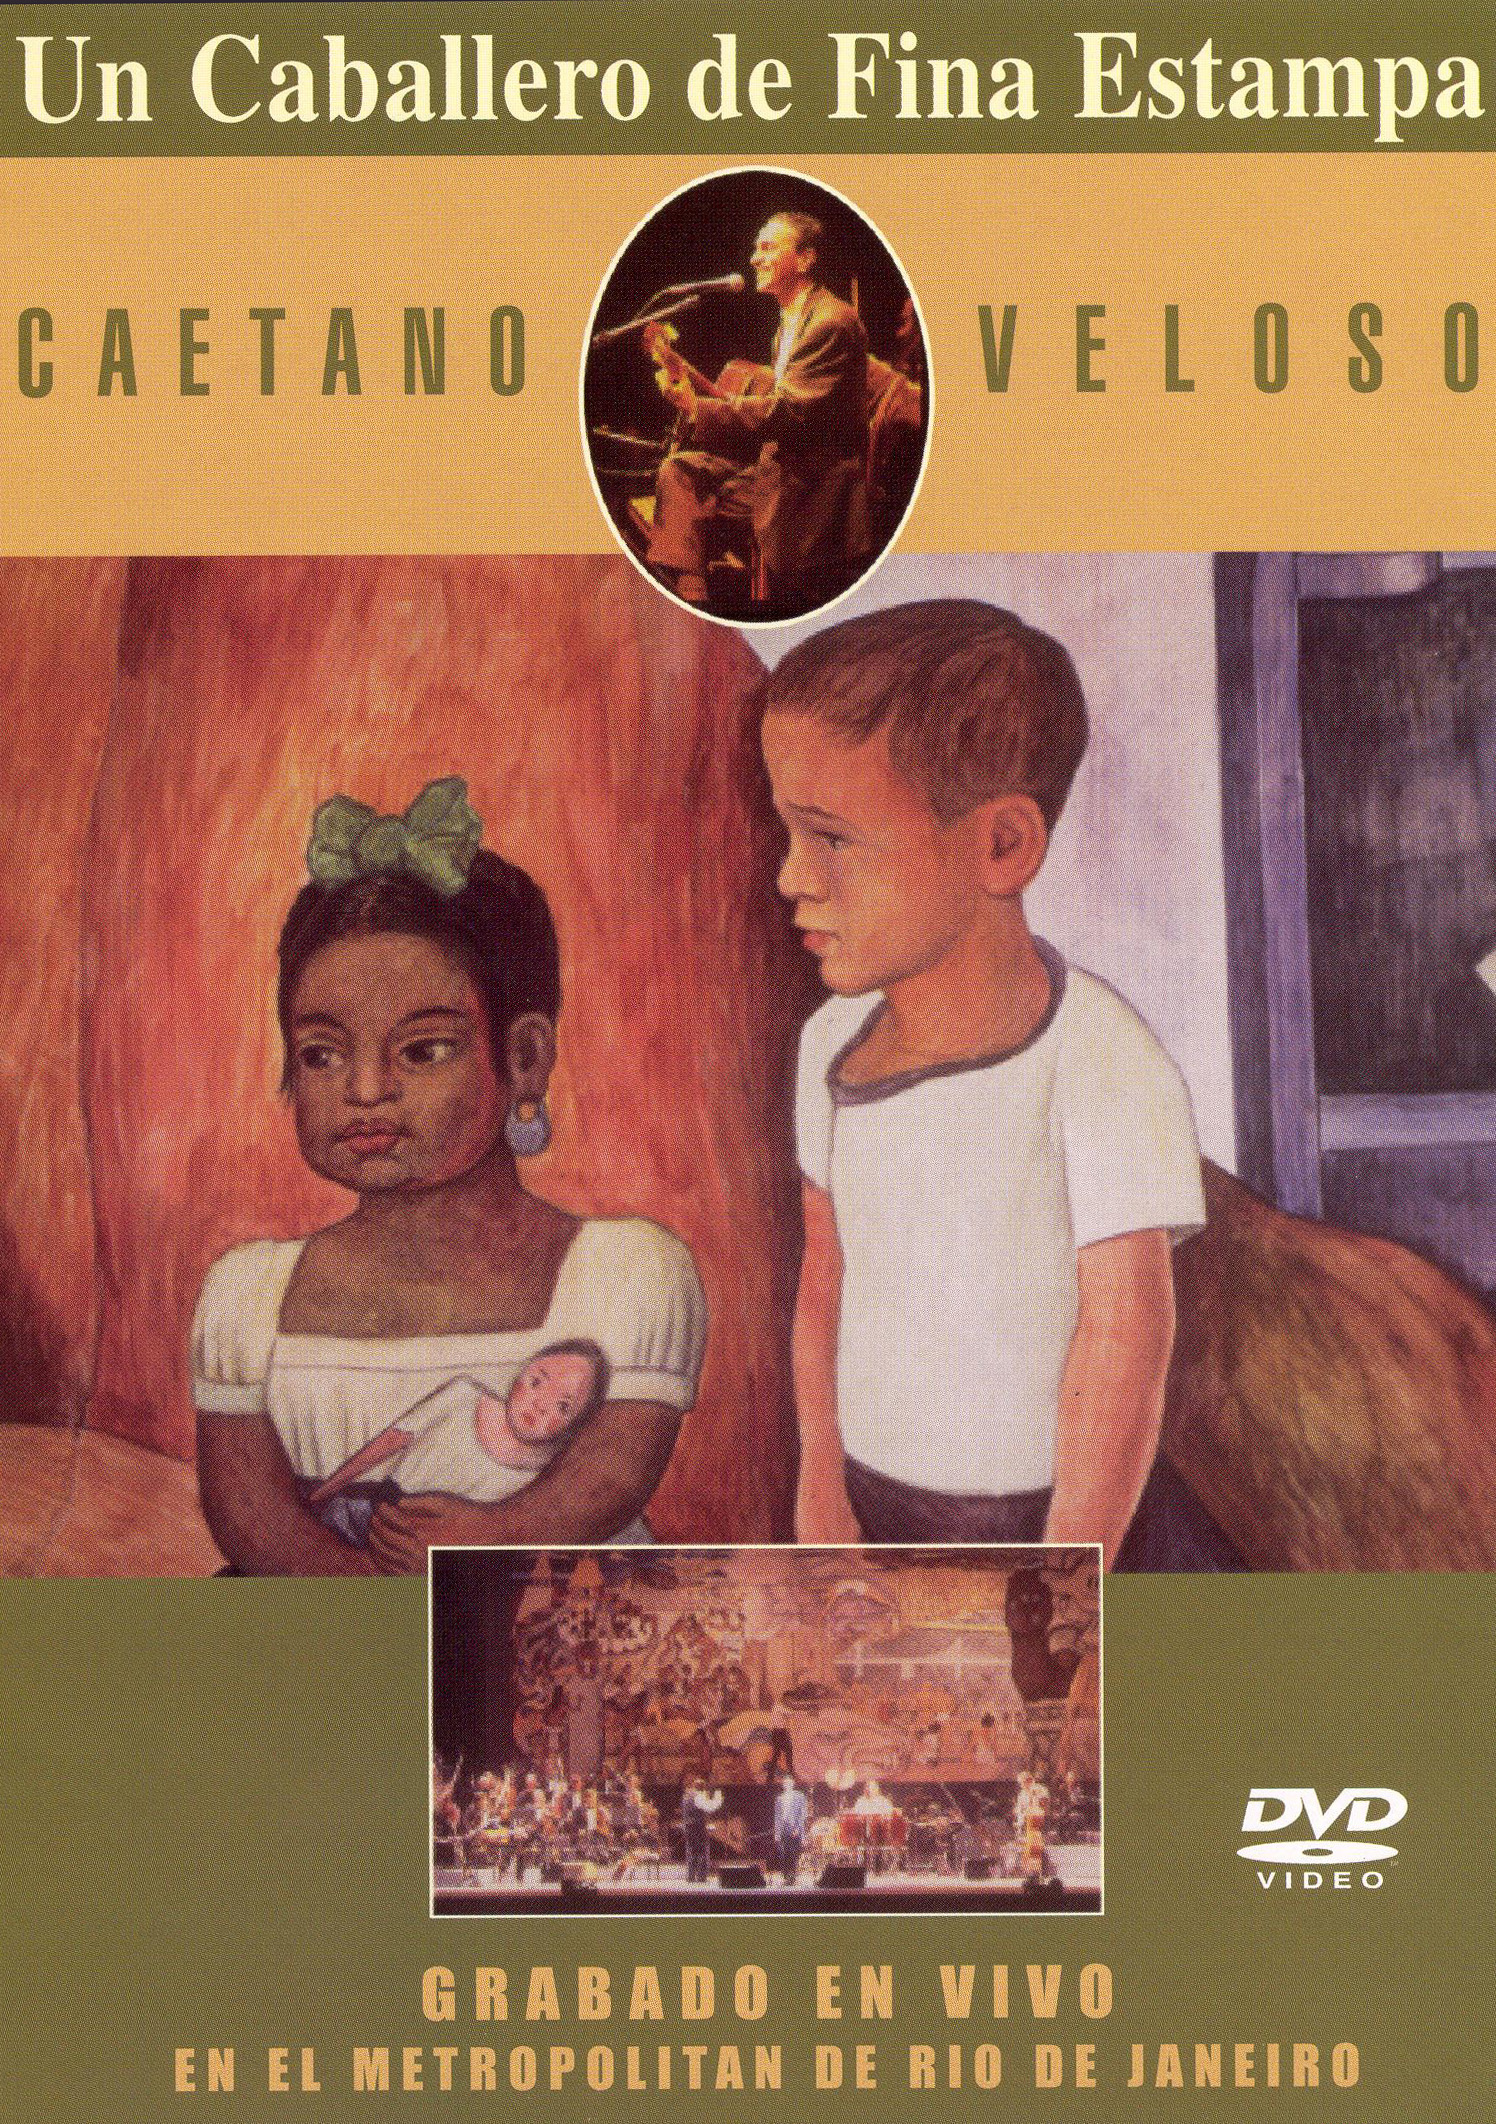 Caetano Veloso: Un Caballero de Fina Estampa